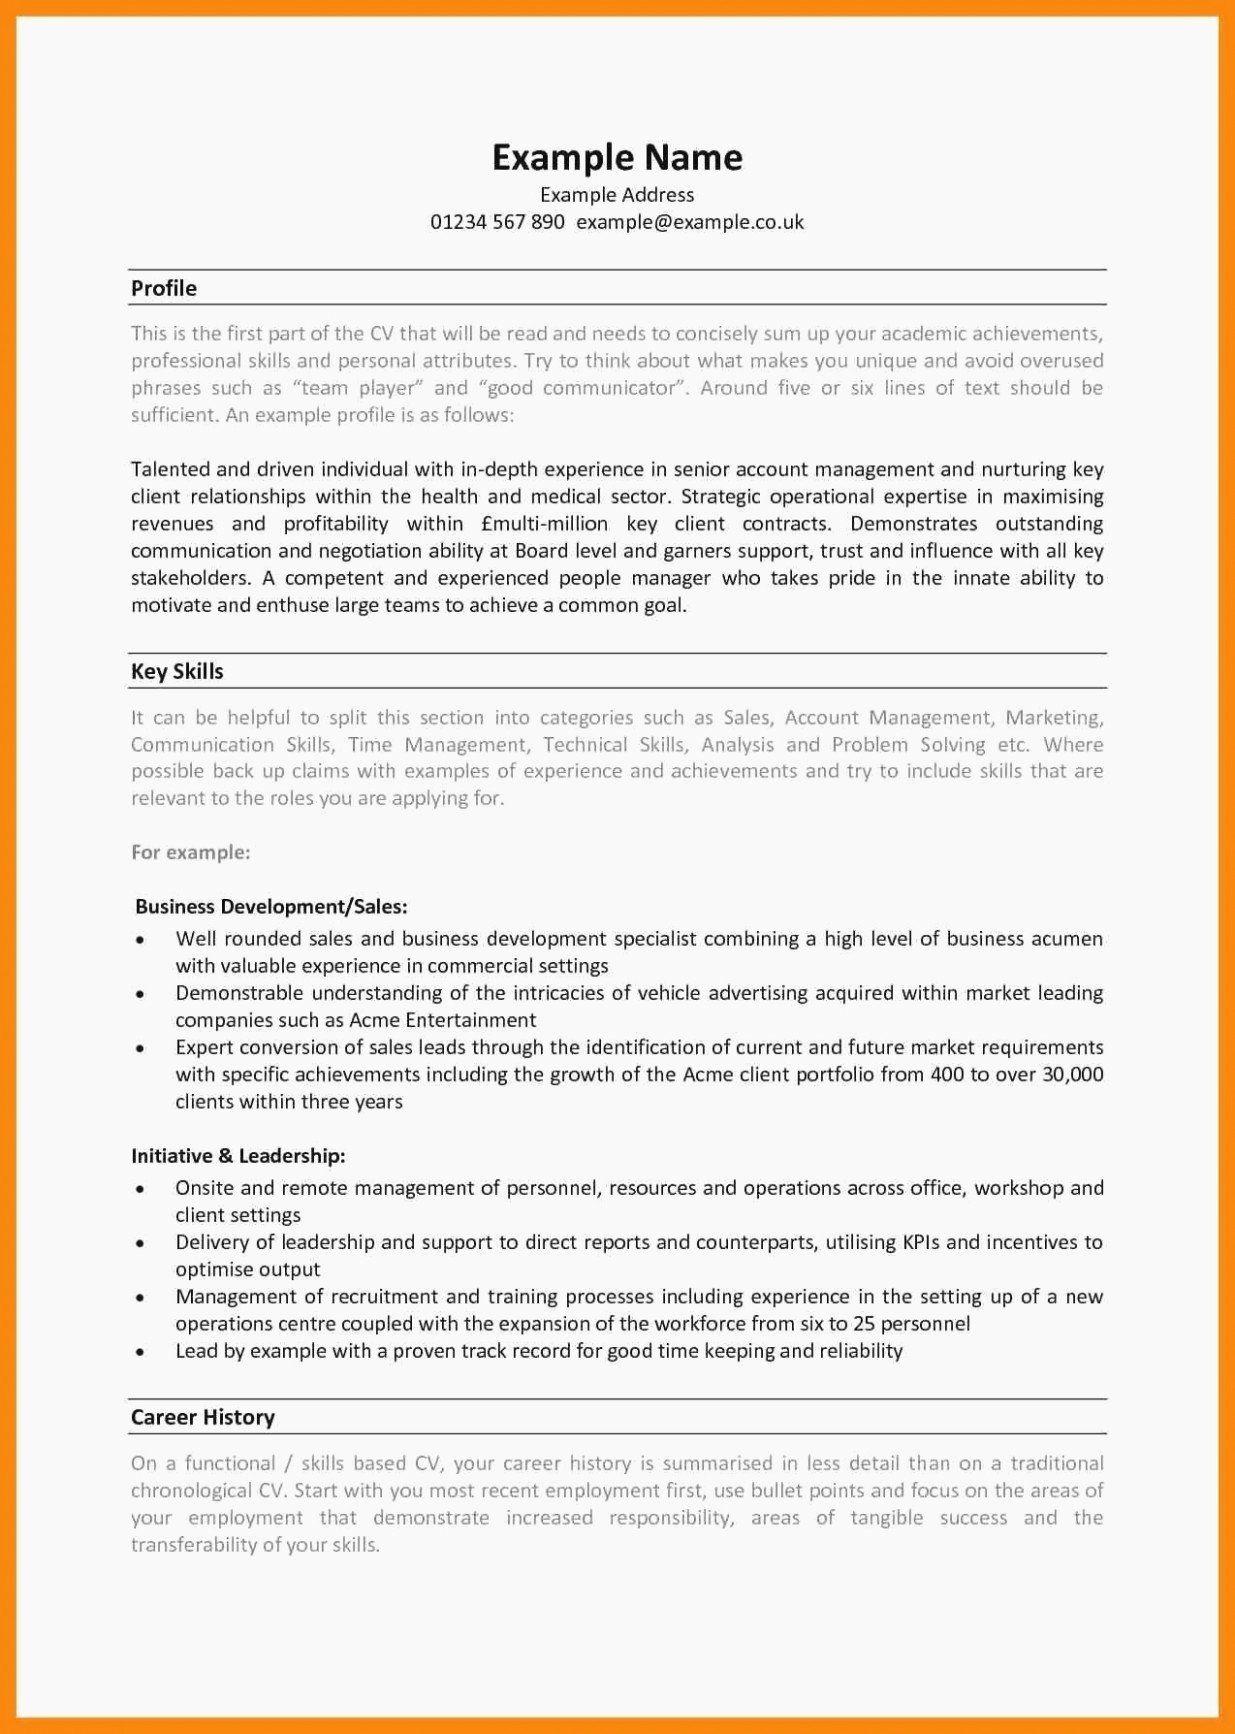 Skills Based Resume Template Free Inspirational 10 Skills Based Resume Template Free Cover Letter For Resume Job Resume Examples Return To Work